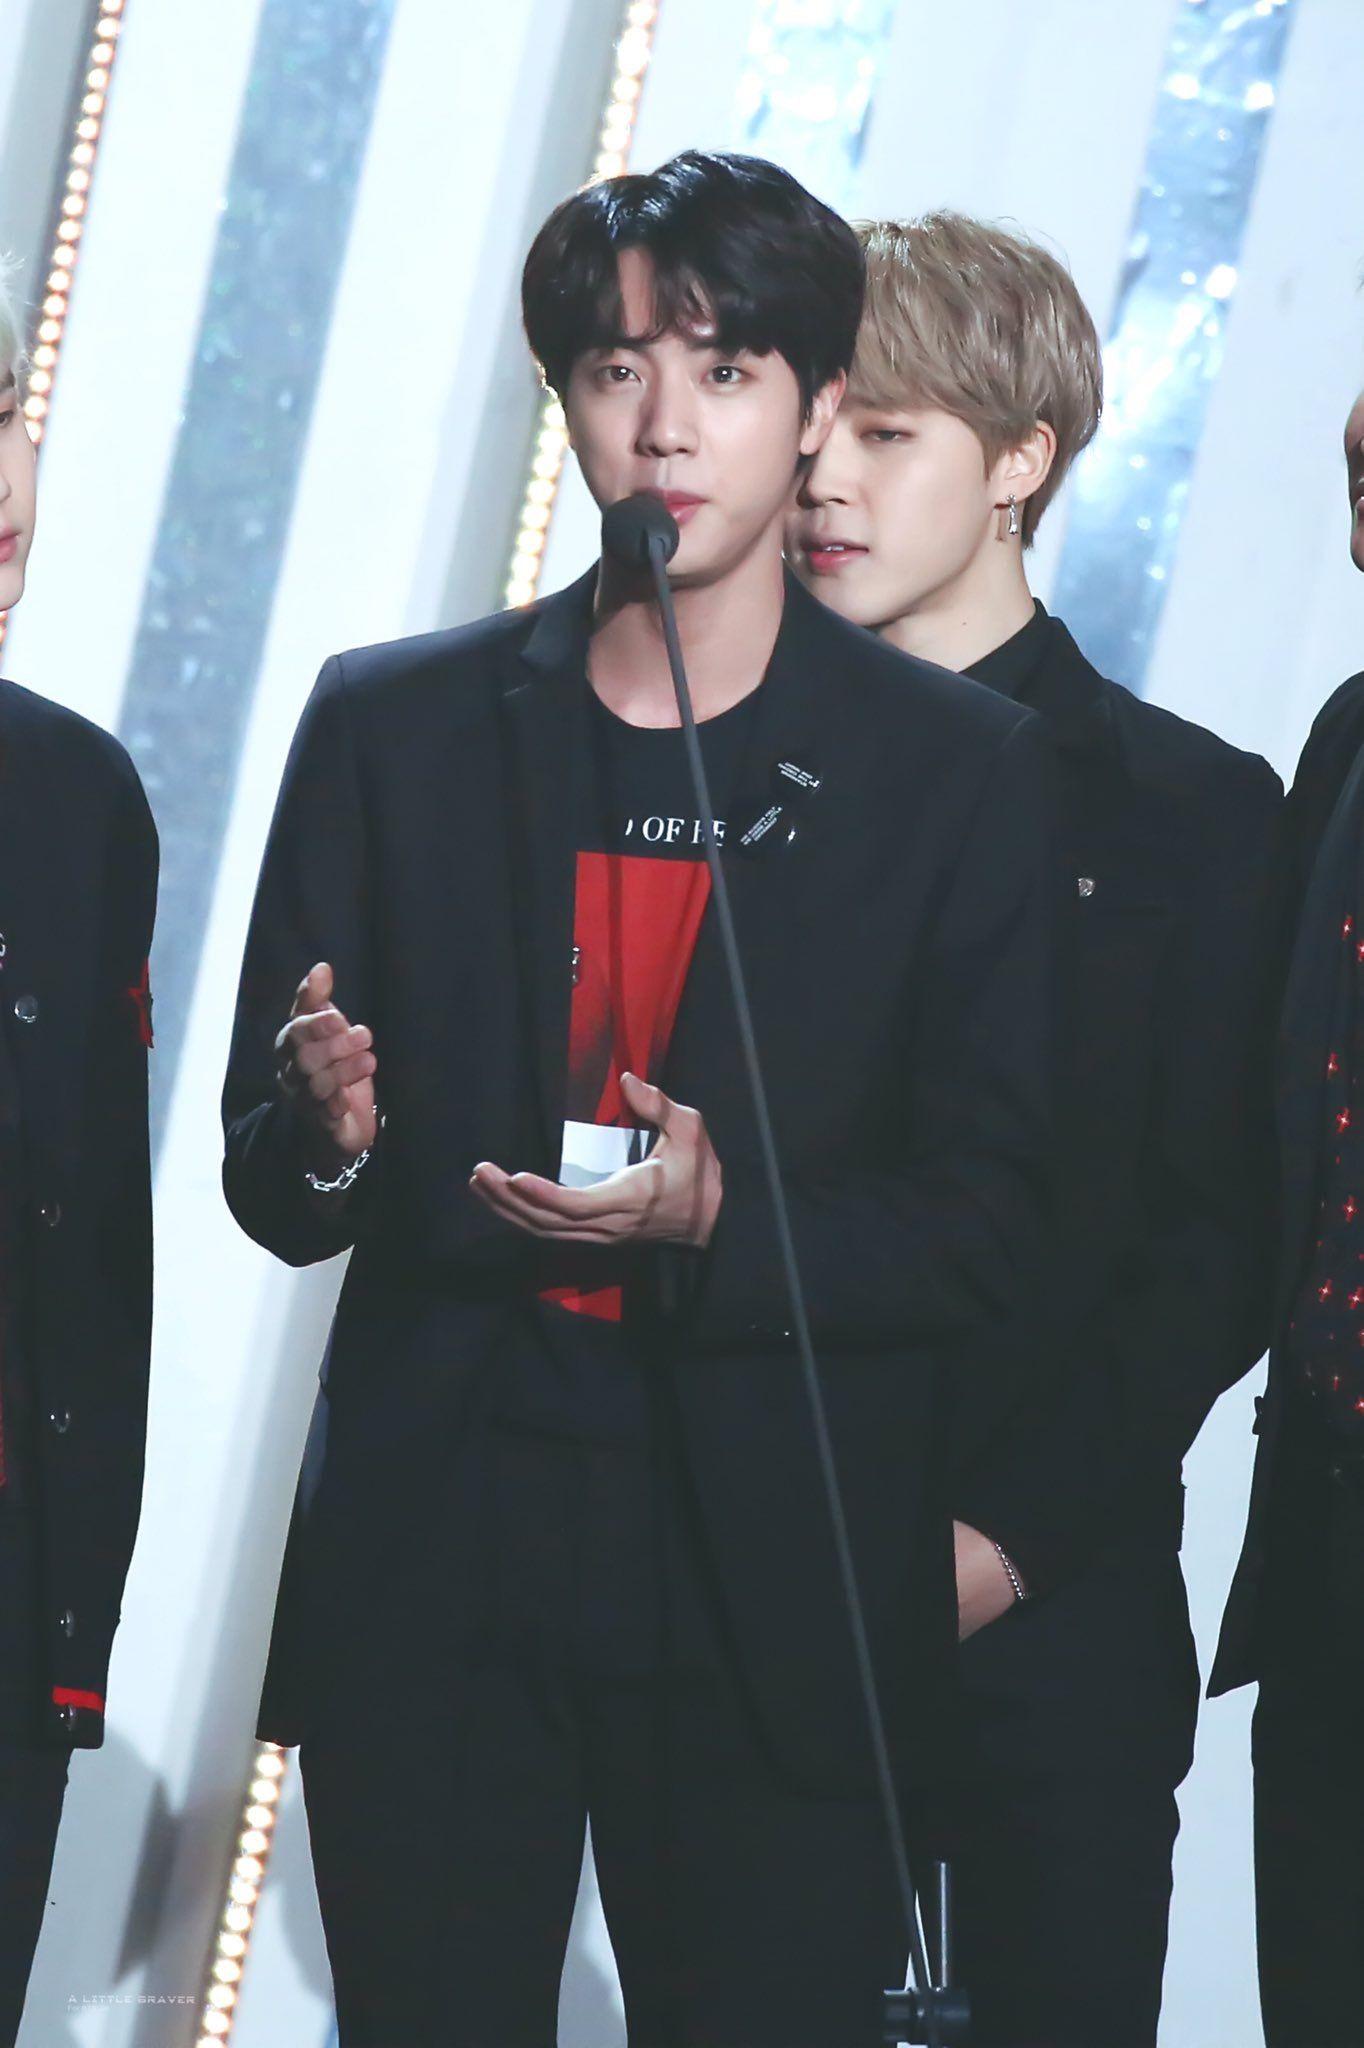 180125 27th Seoul Music Awards 2018 Jin Bts